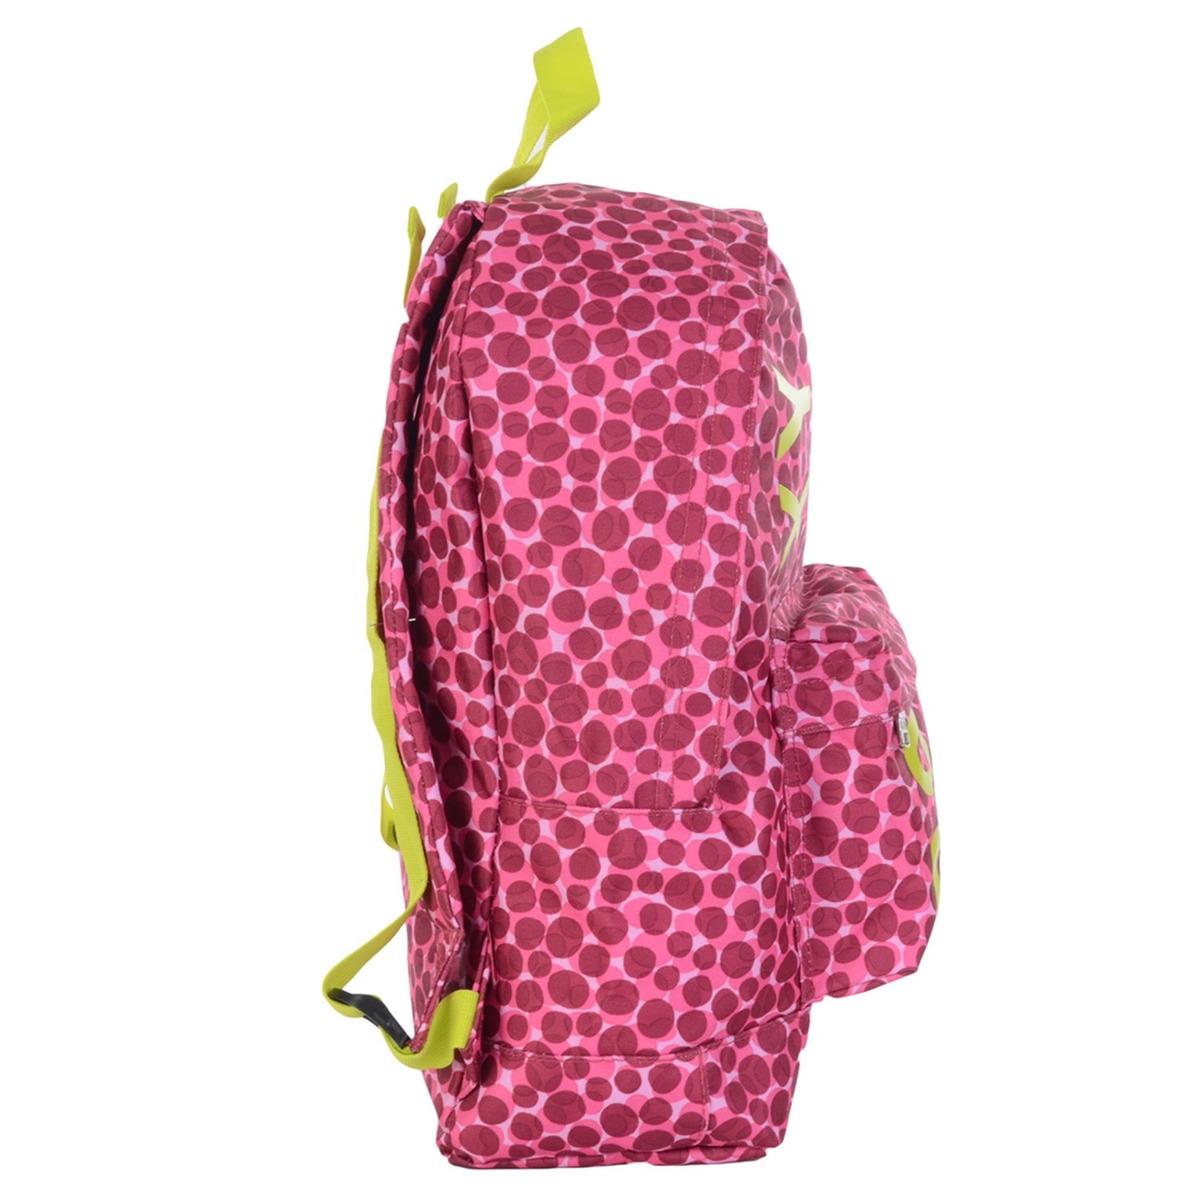 99bc336af Mochila Roxy Sugar Baby Dot On Dots Rosa - R$ 59,90 em Mercado Livre